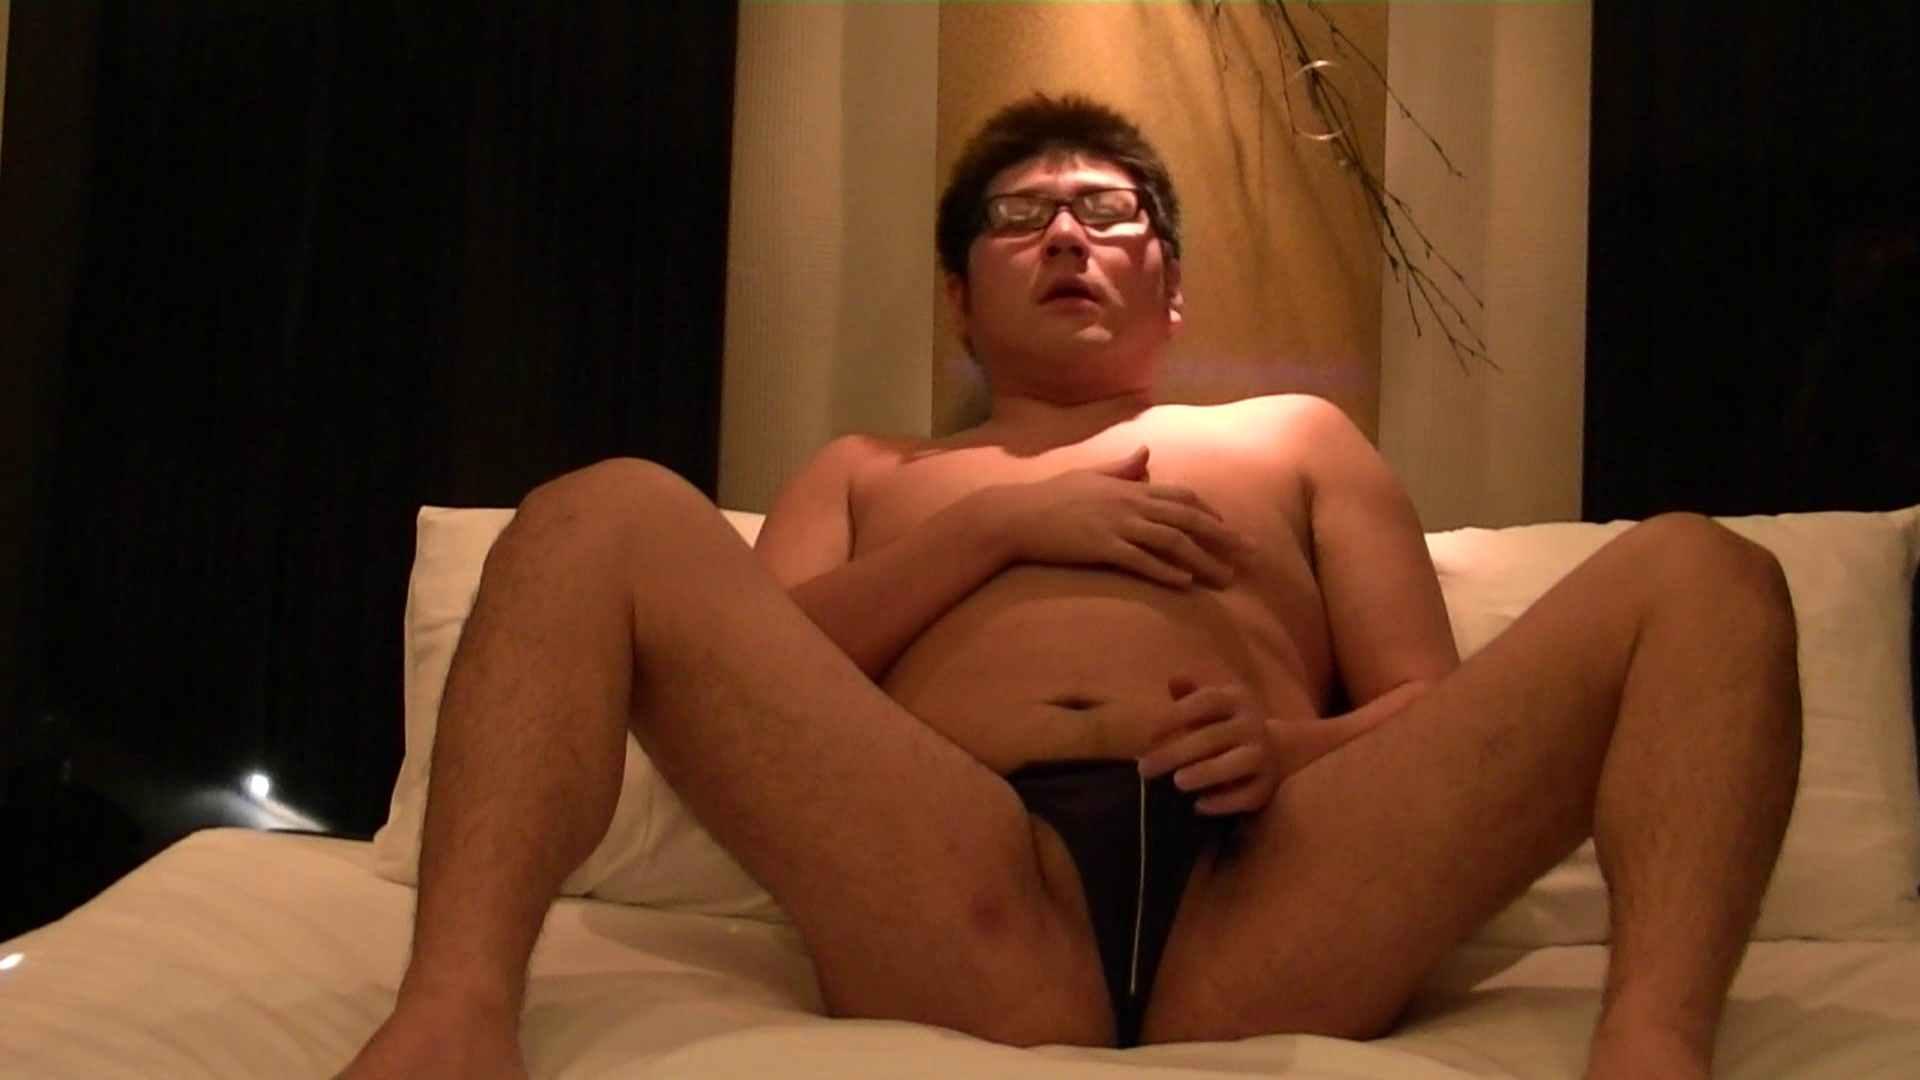 Mr.オナックスさん投稿!HD 貴方のオナニー三万円で撮影させてください。VOL.02 前編 0 | オナニー特集  72pic 29